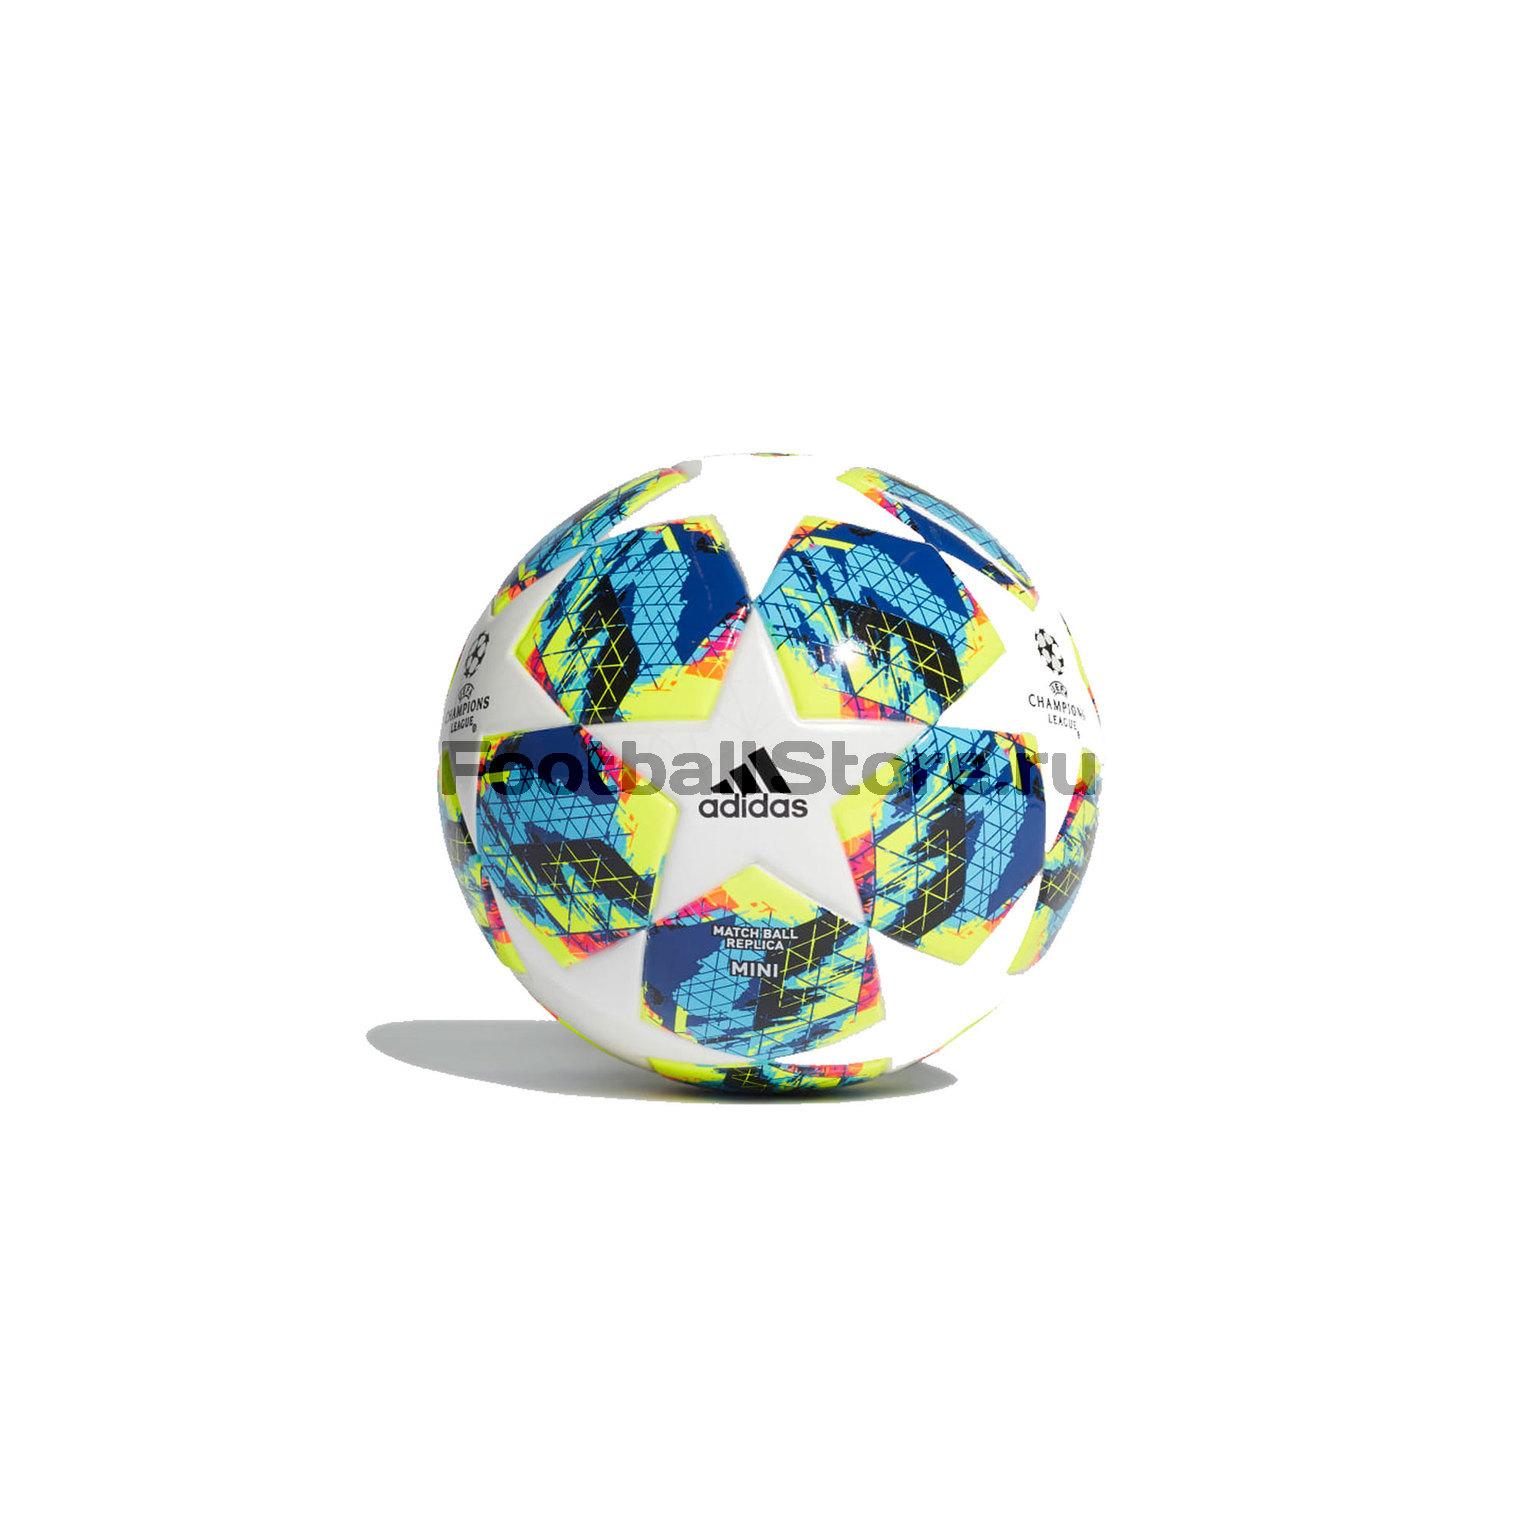 Мяч сувенирный Adidas Finale Mini DY2563